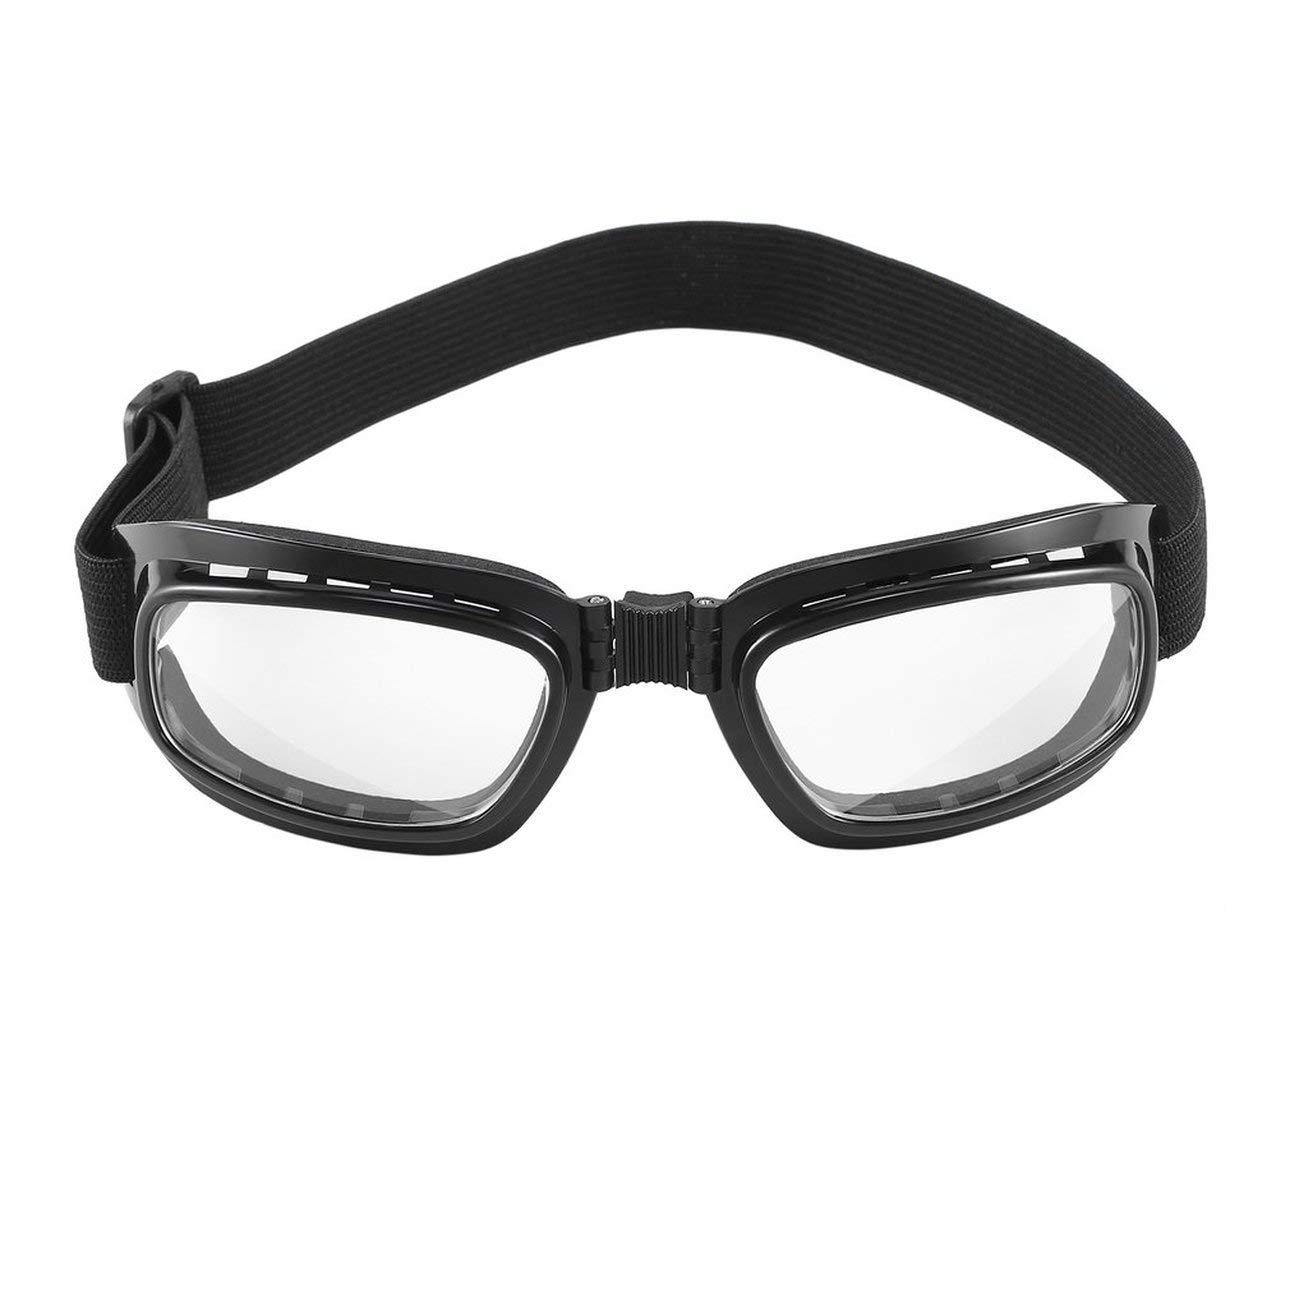 Liobaba Foldable Vintage Motorcycle Glasses Windproof Goggles Ski Snowboard Glasses Off Road Racing Eyewear Dustproof Goggles